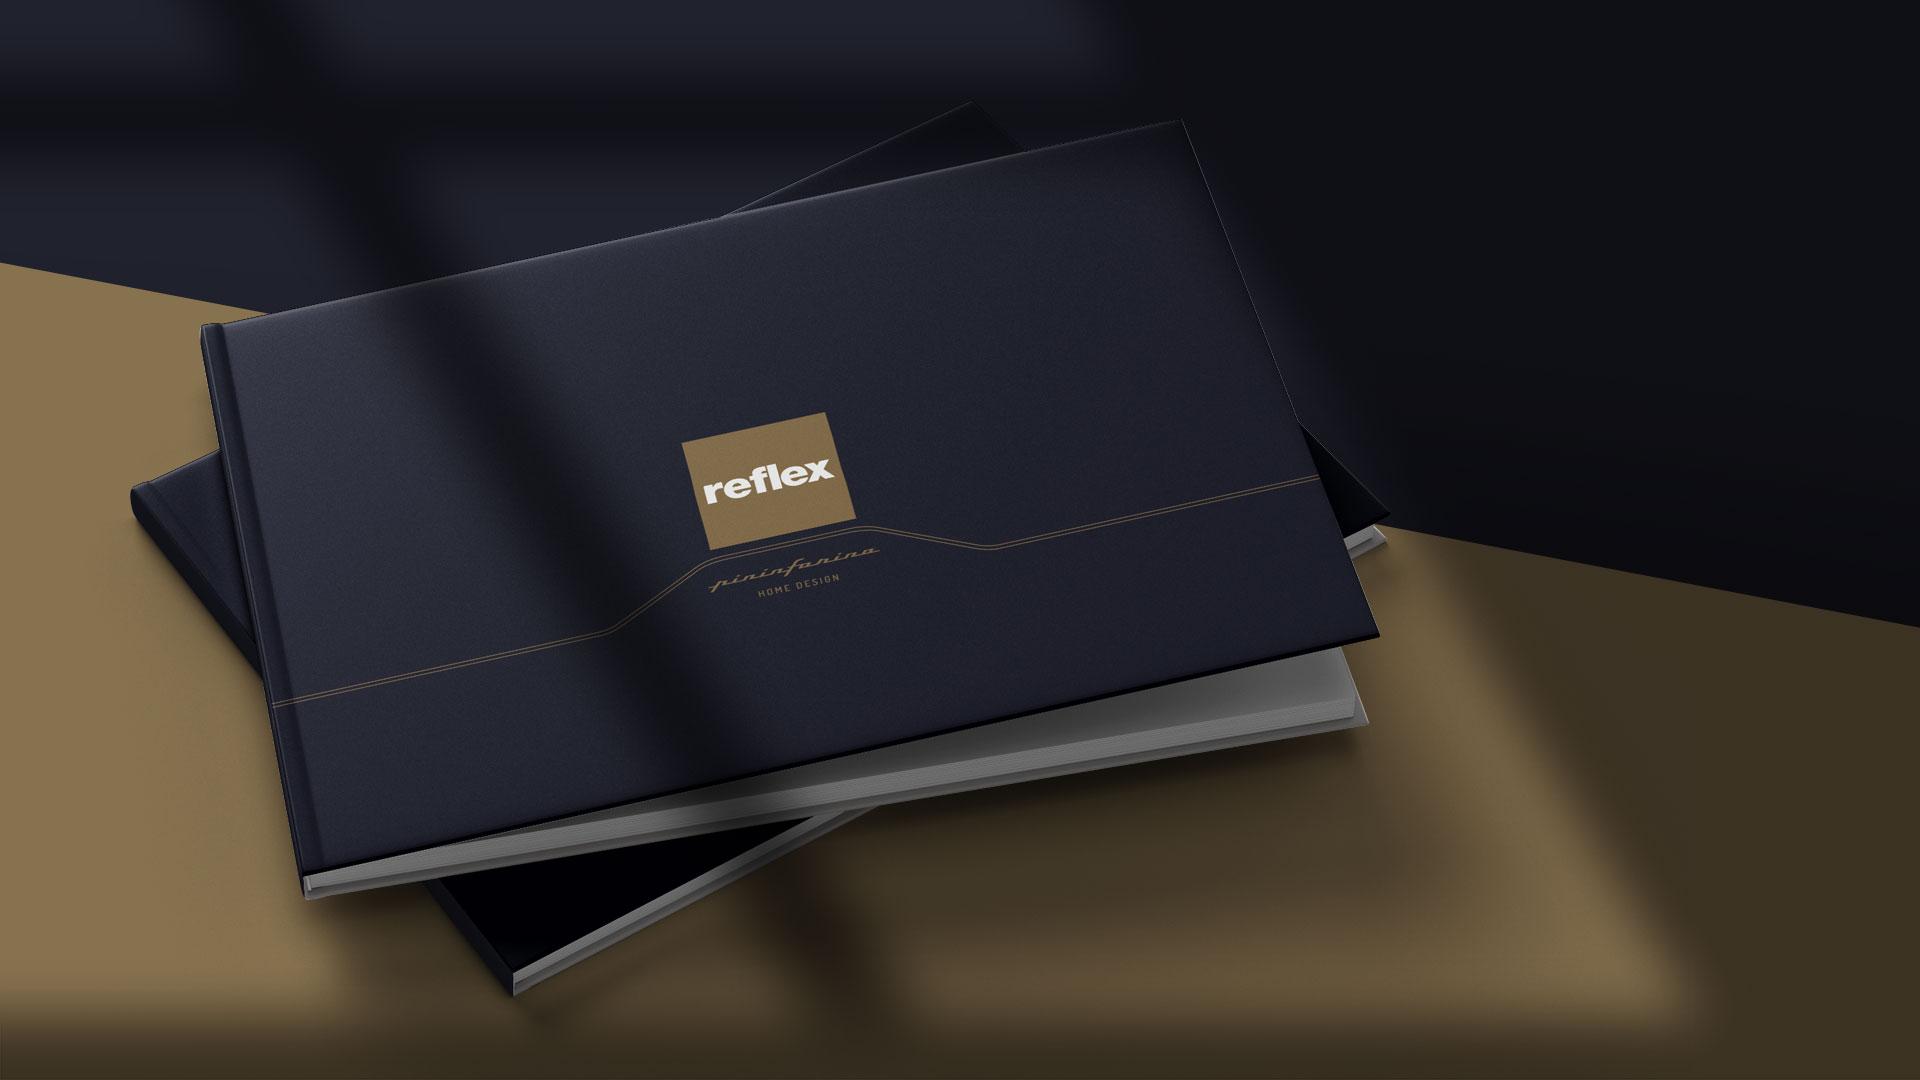 00 catalogue reflex pininfarina grafico milano slide home